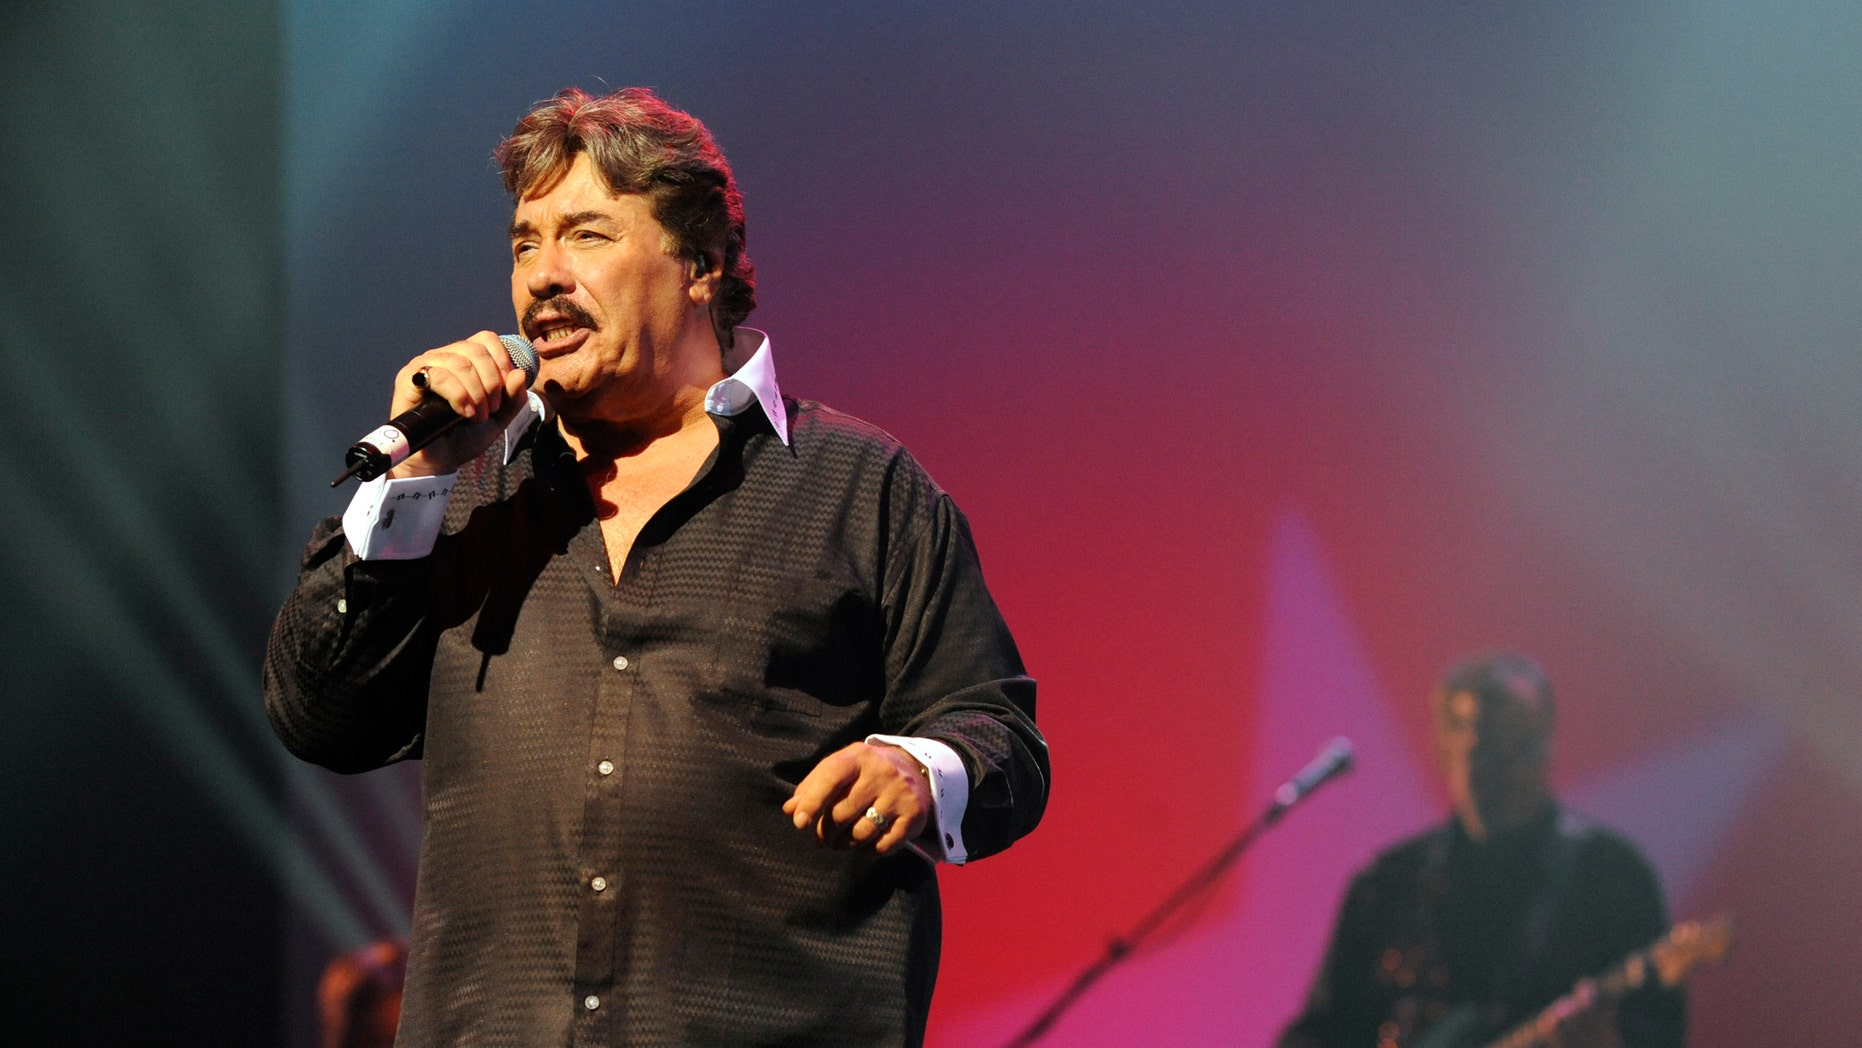 November 8, 2011. Tony Orlando singing at the Welk Resort Theater in Branson, Missouri.